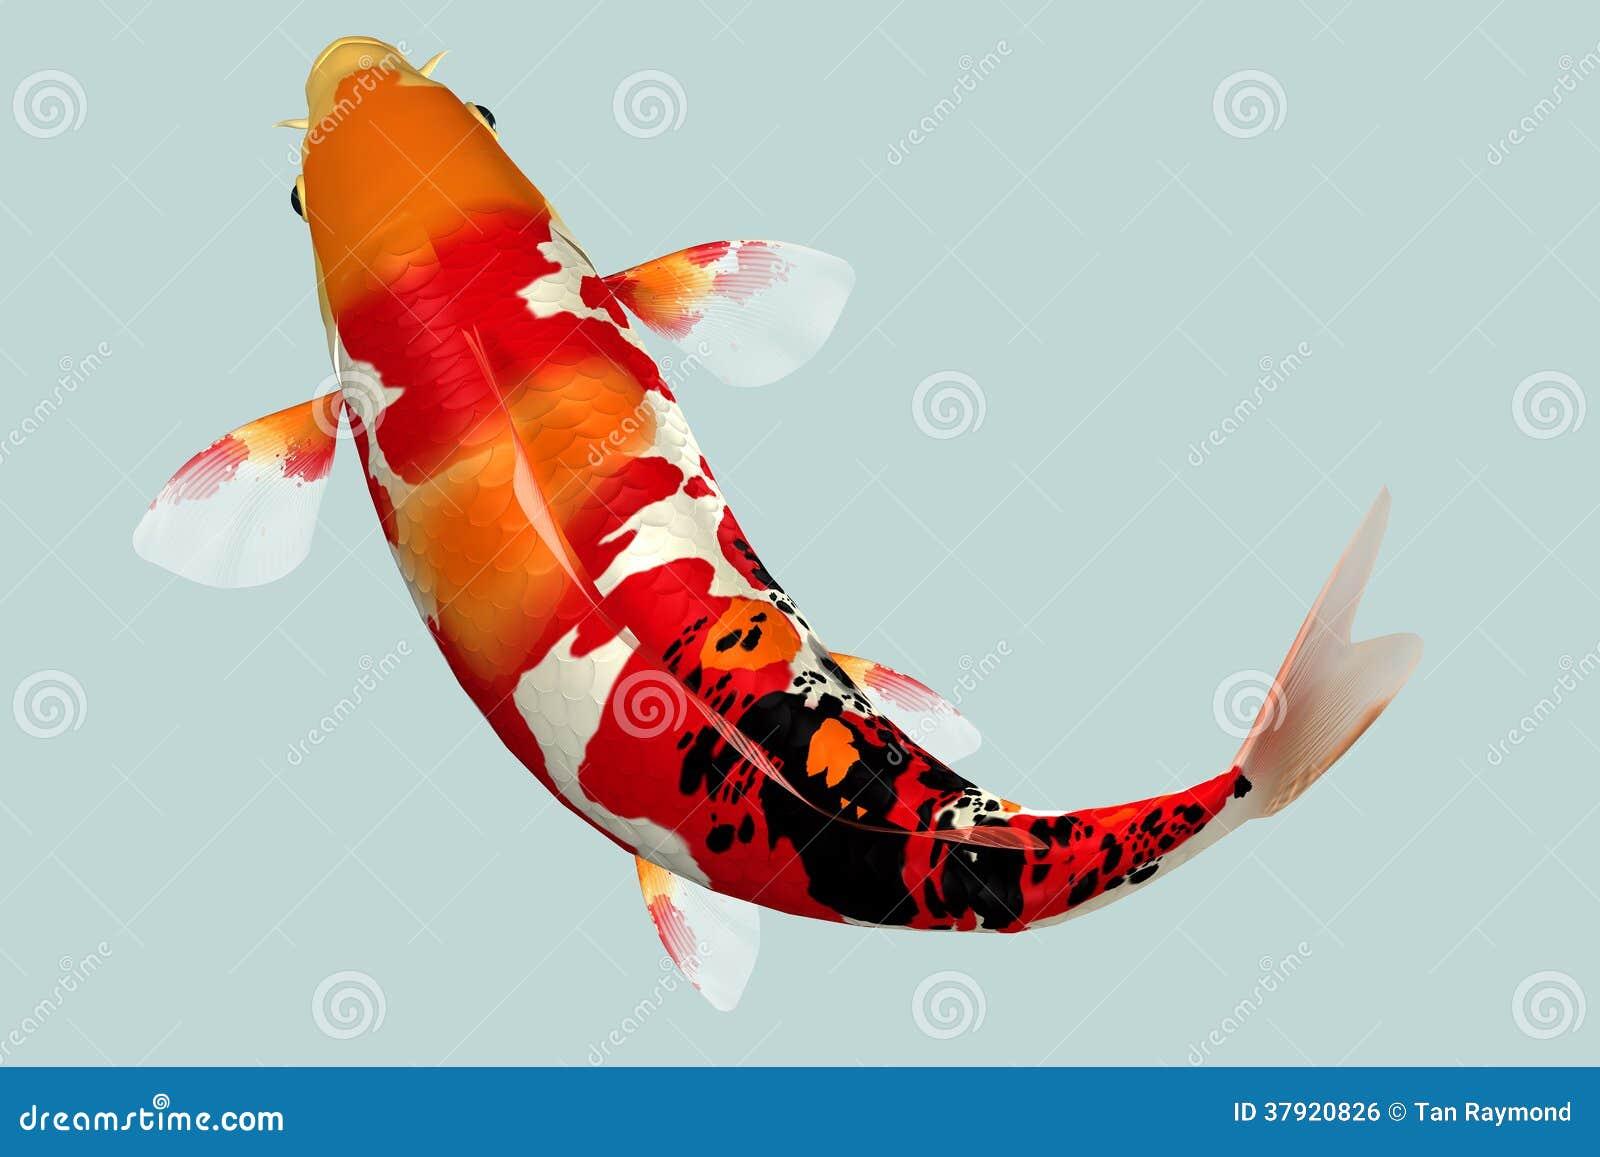 Poissons de koi image libre de droits image 37920826 for Koi poisson prix